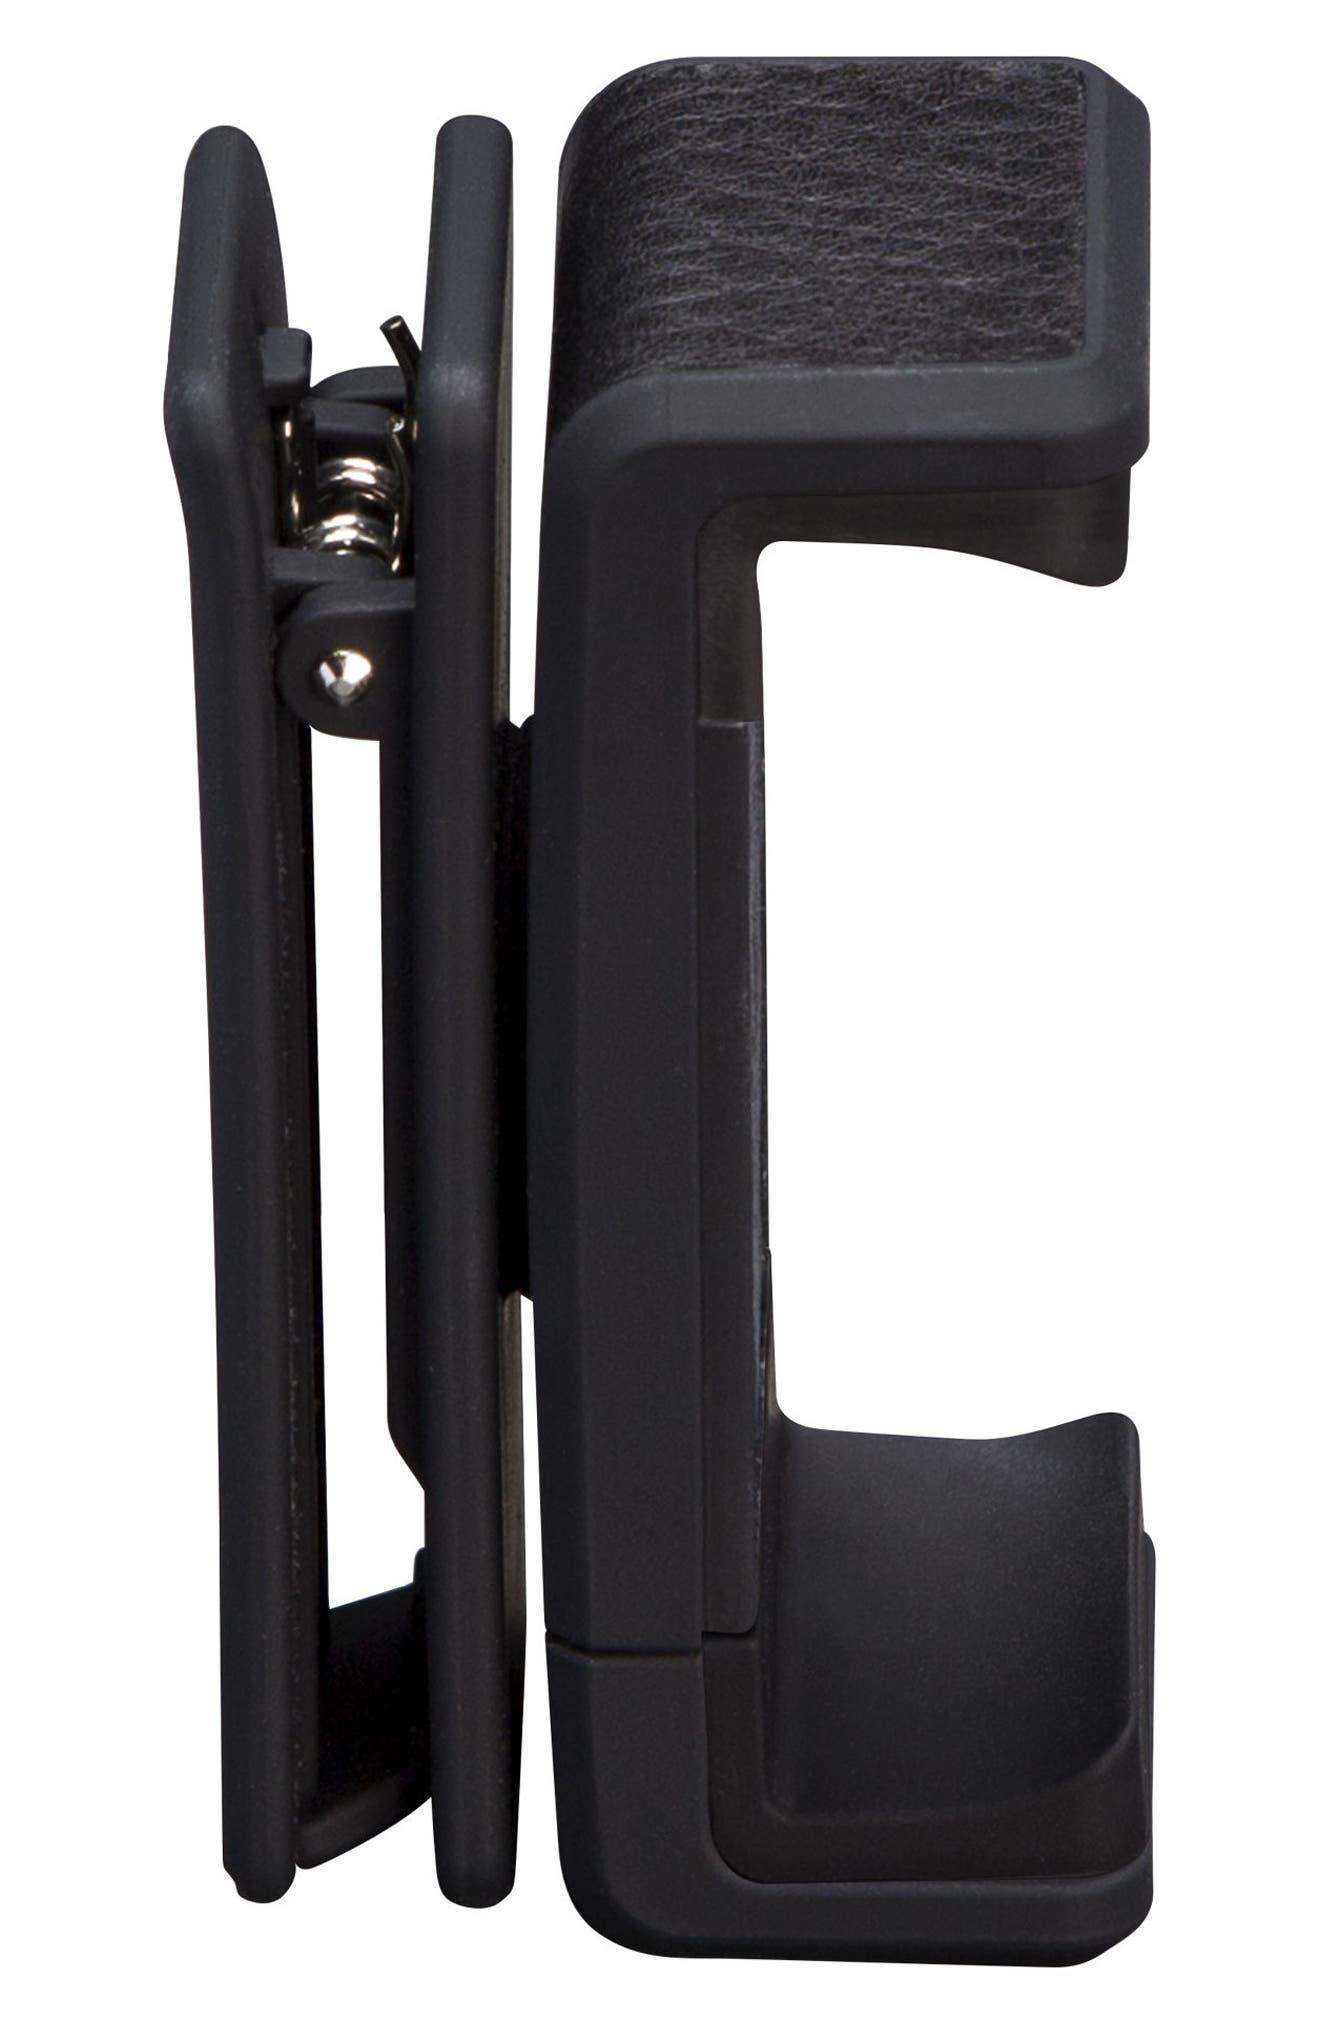 Universal Smartphone Beltclip,                             Alternate thumbnail 2, color,                             BLACK